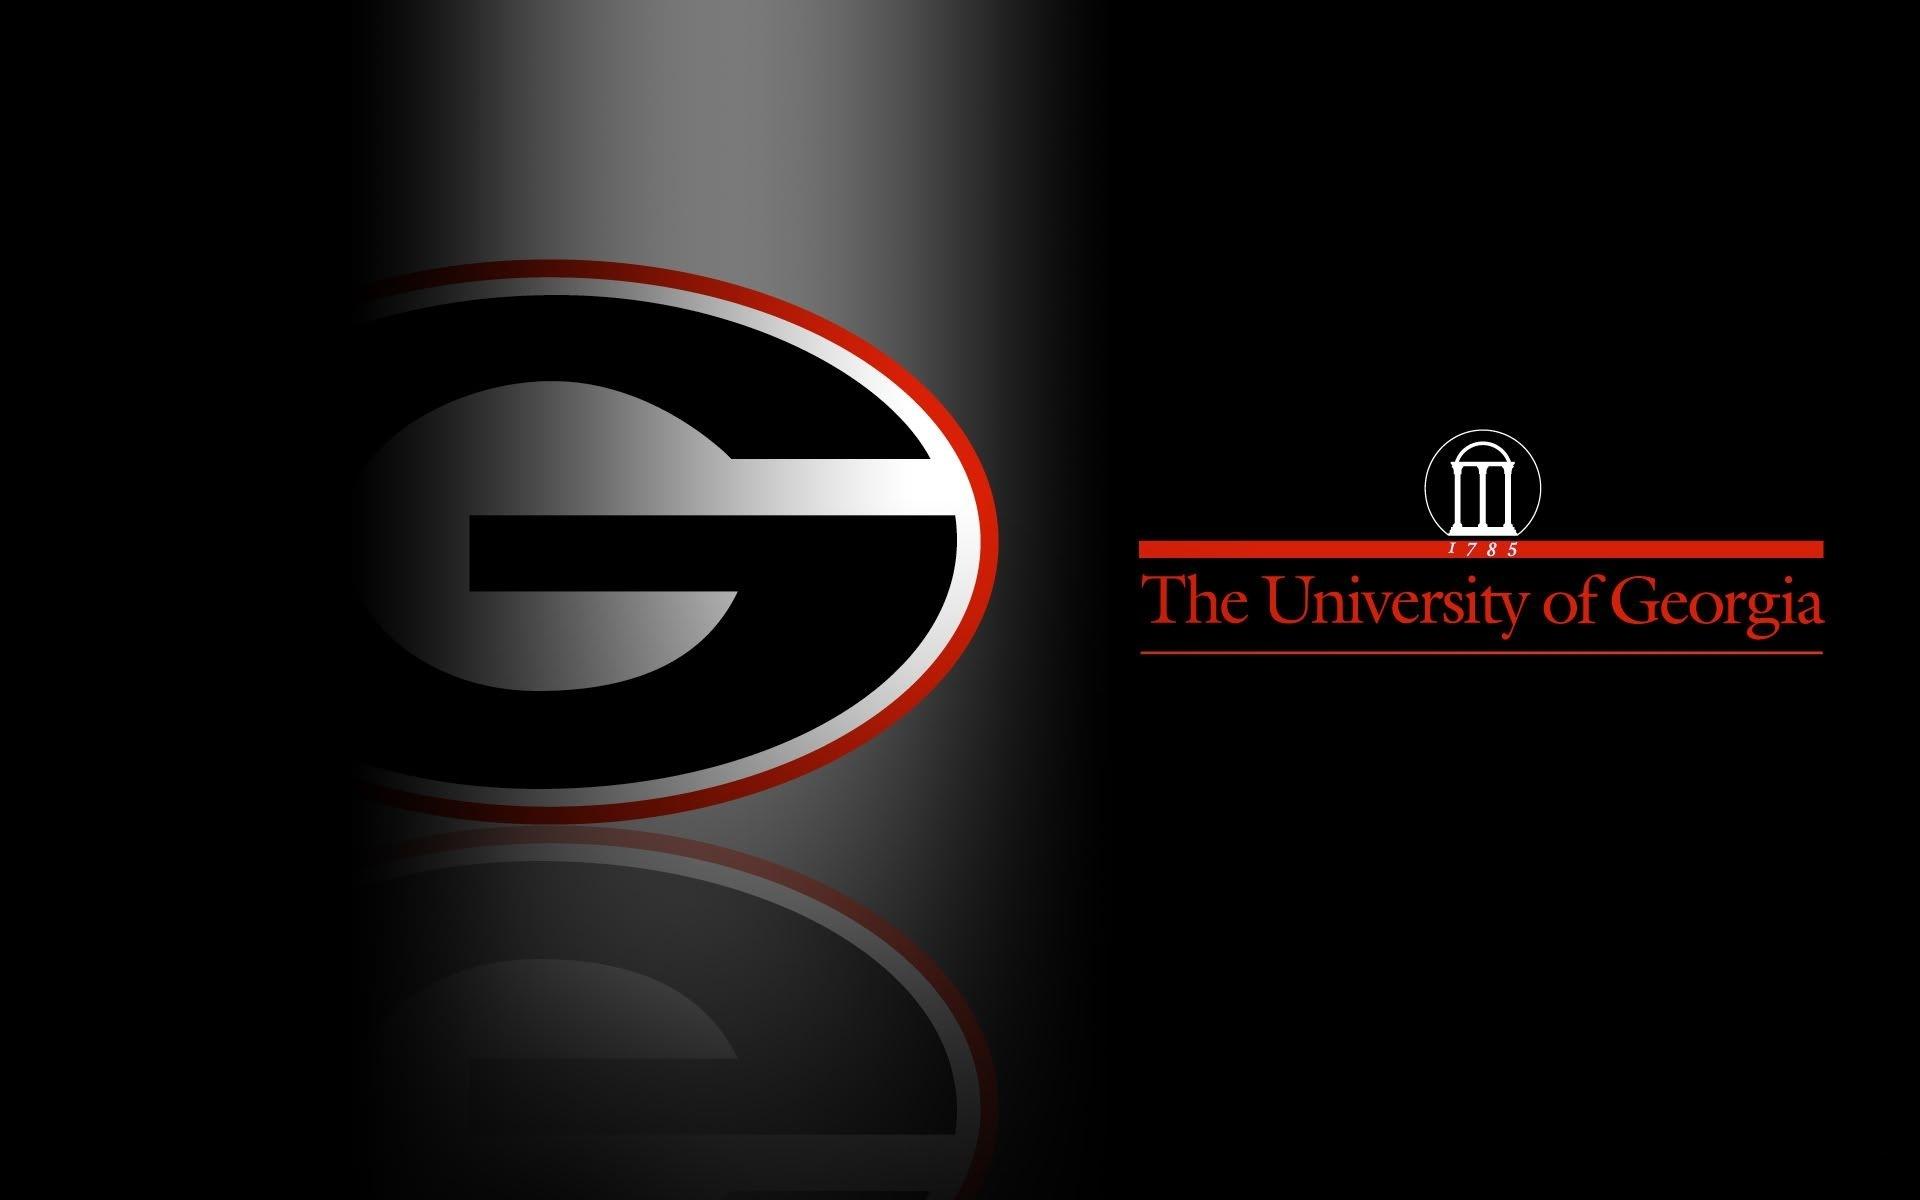 university of georgia wallpaper - georgia bulldogs | georgia